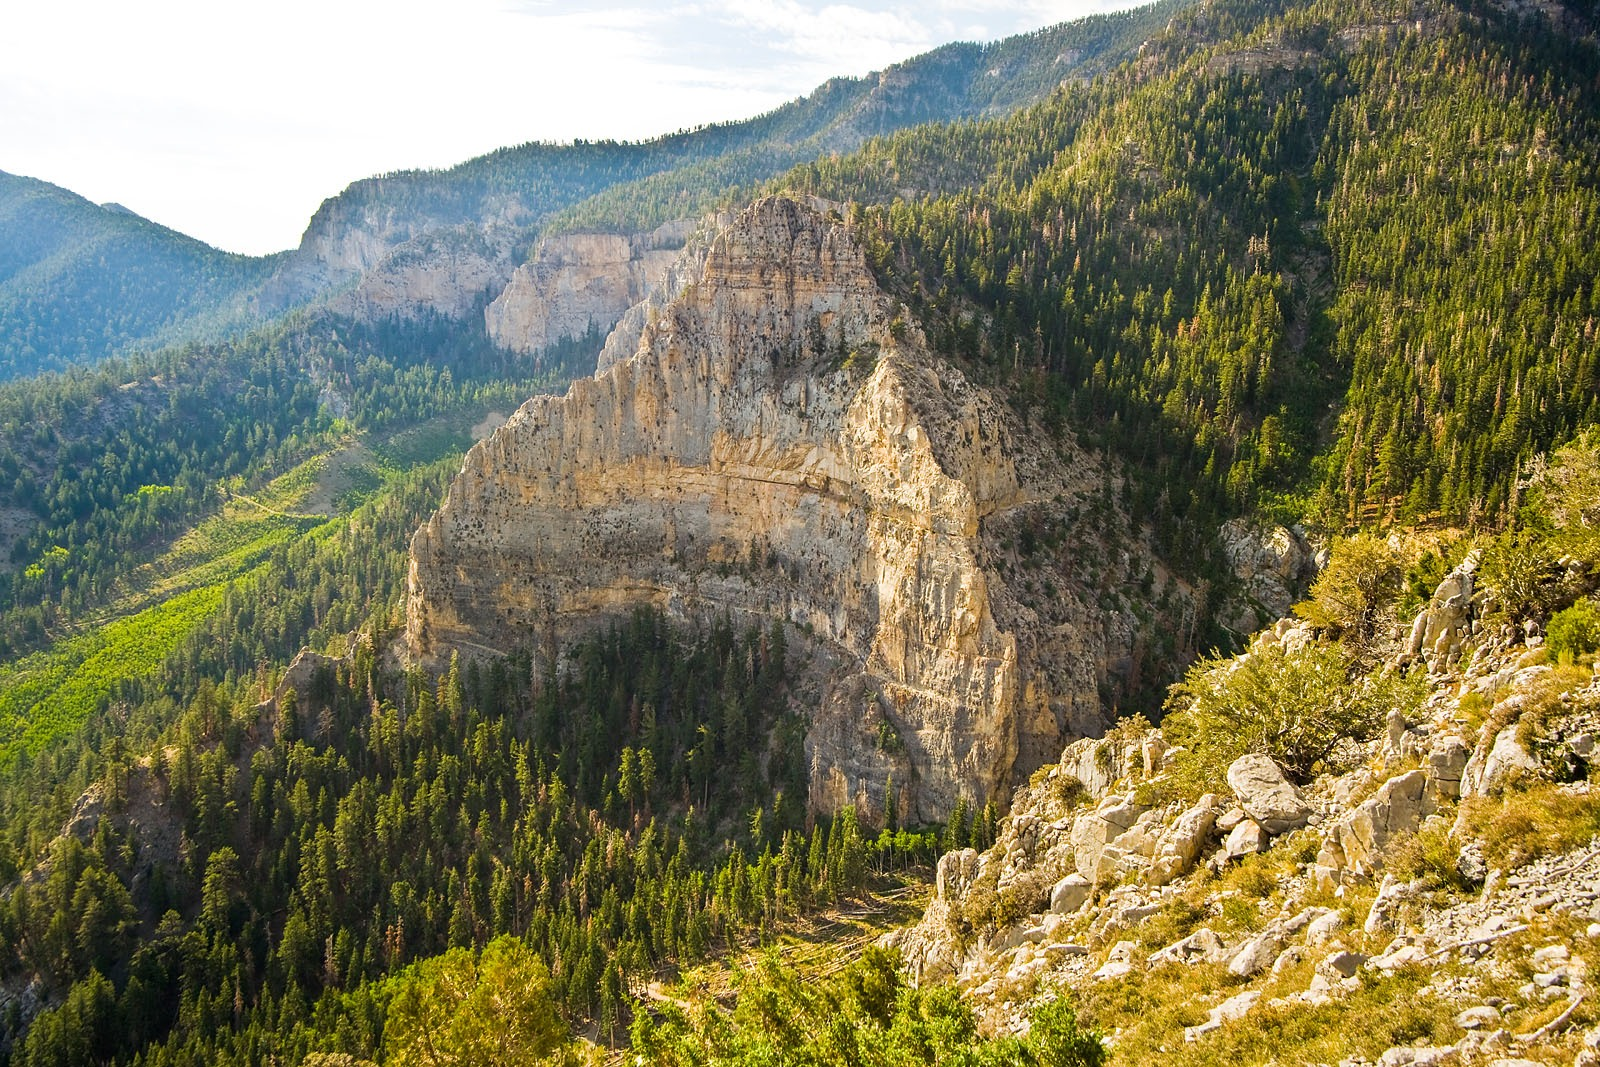 BSFAimages Scenic Landscape Vistas Q4G9996_v2_